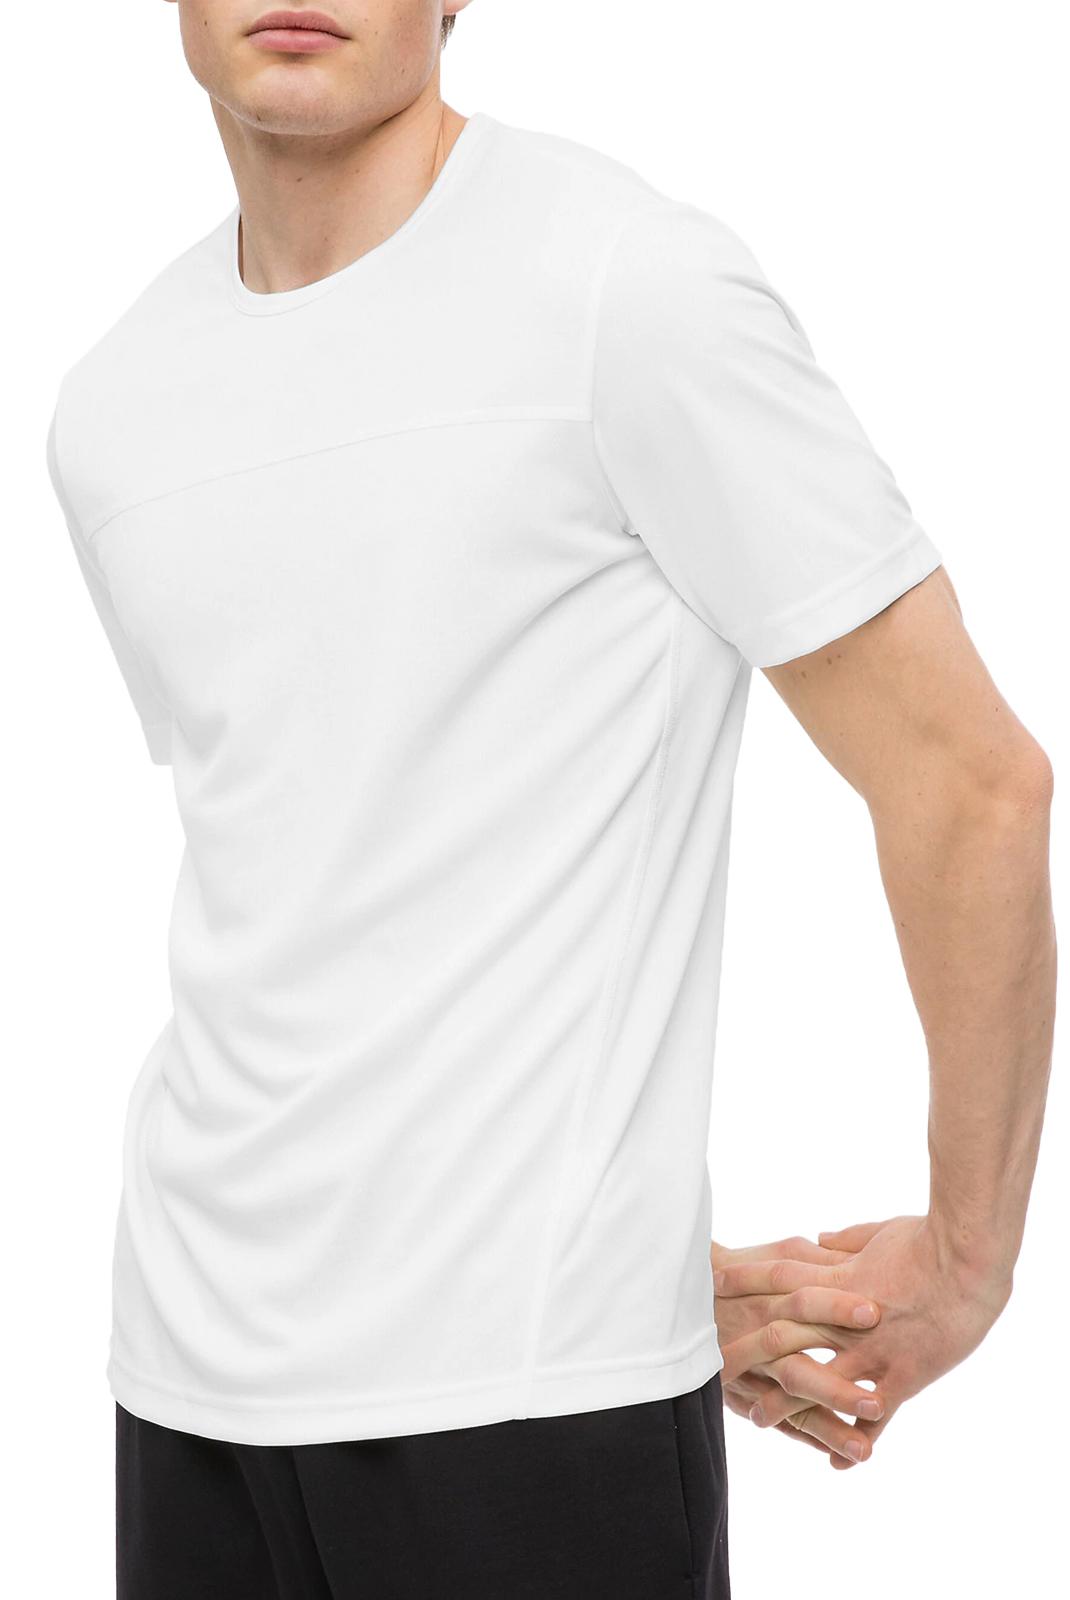 T-S manches courtes  Calvin klein 00GMS8K104-100 Bright White